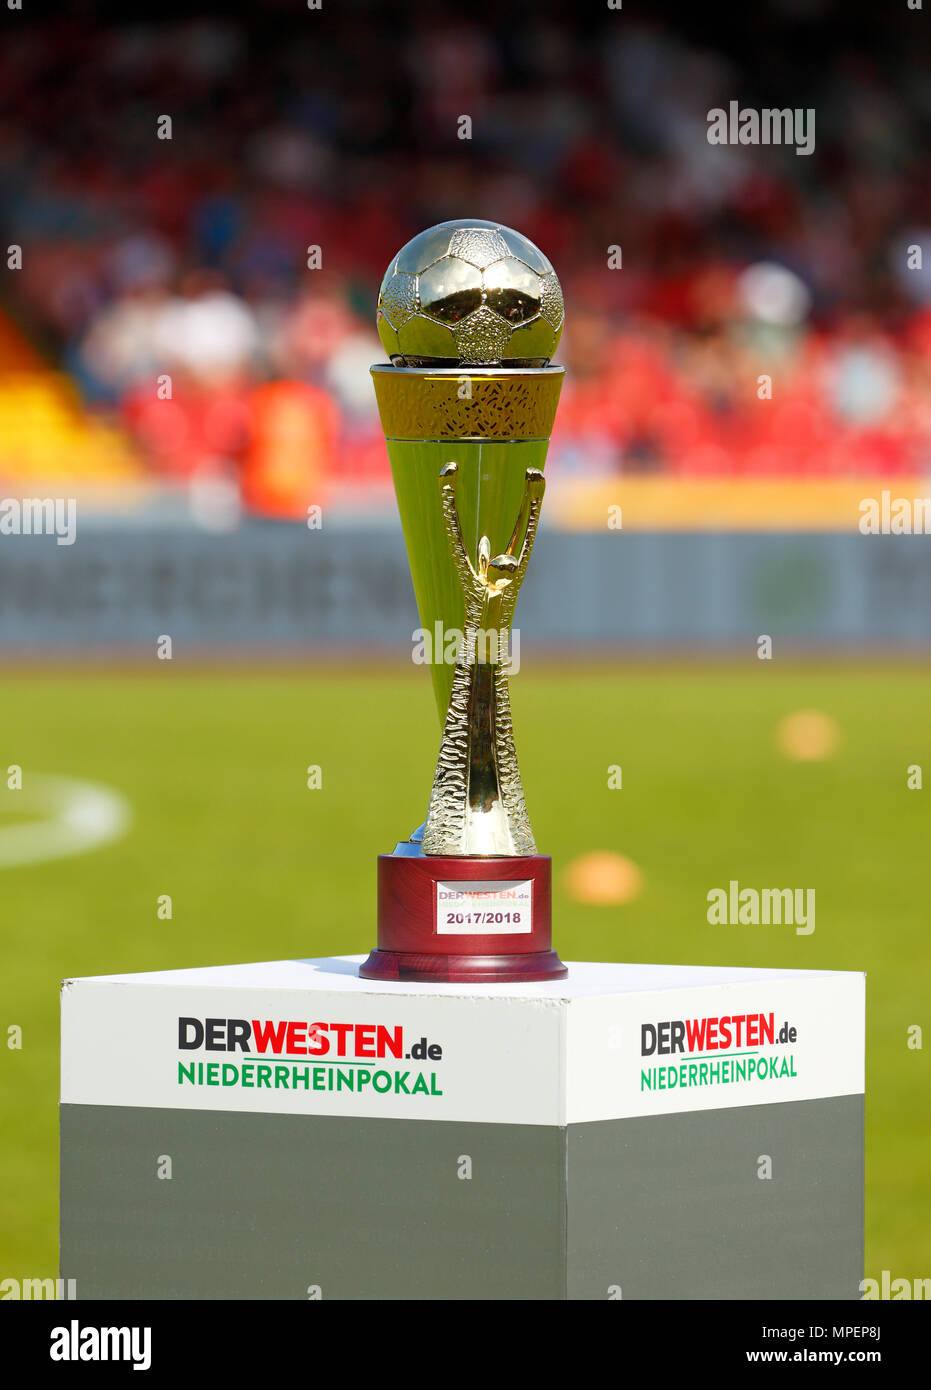 sports, football, Lower Rhine Cup, 2017/2018, final, Rot-Weiss Oberhausen vs Rot Weiss Essen 2:1, Stadium Niederrhein Oberhausen, DERWESTEN.de prize cup on a stand - Stock Image